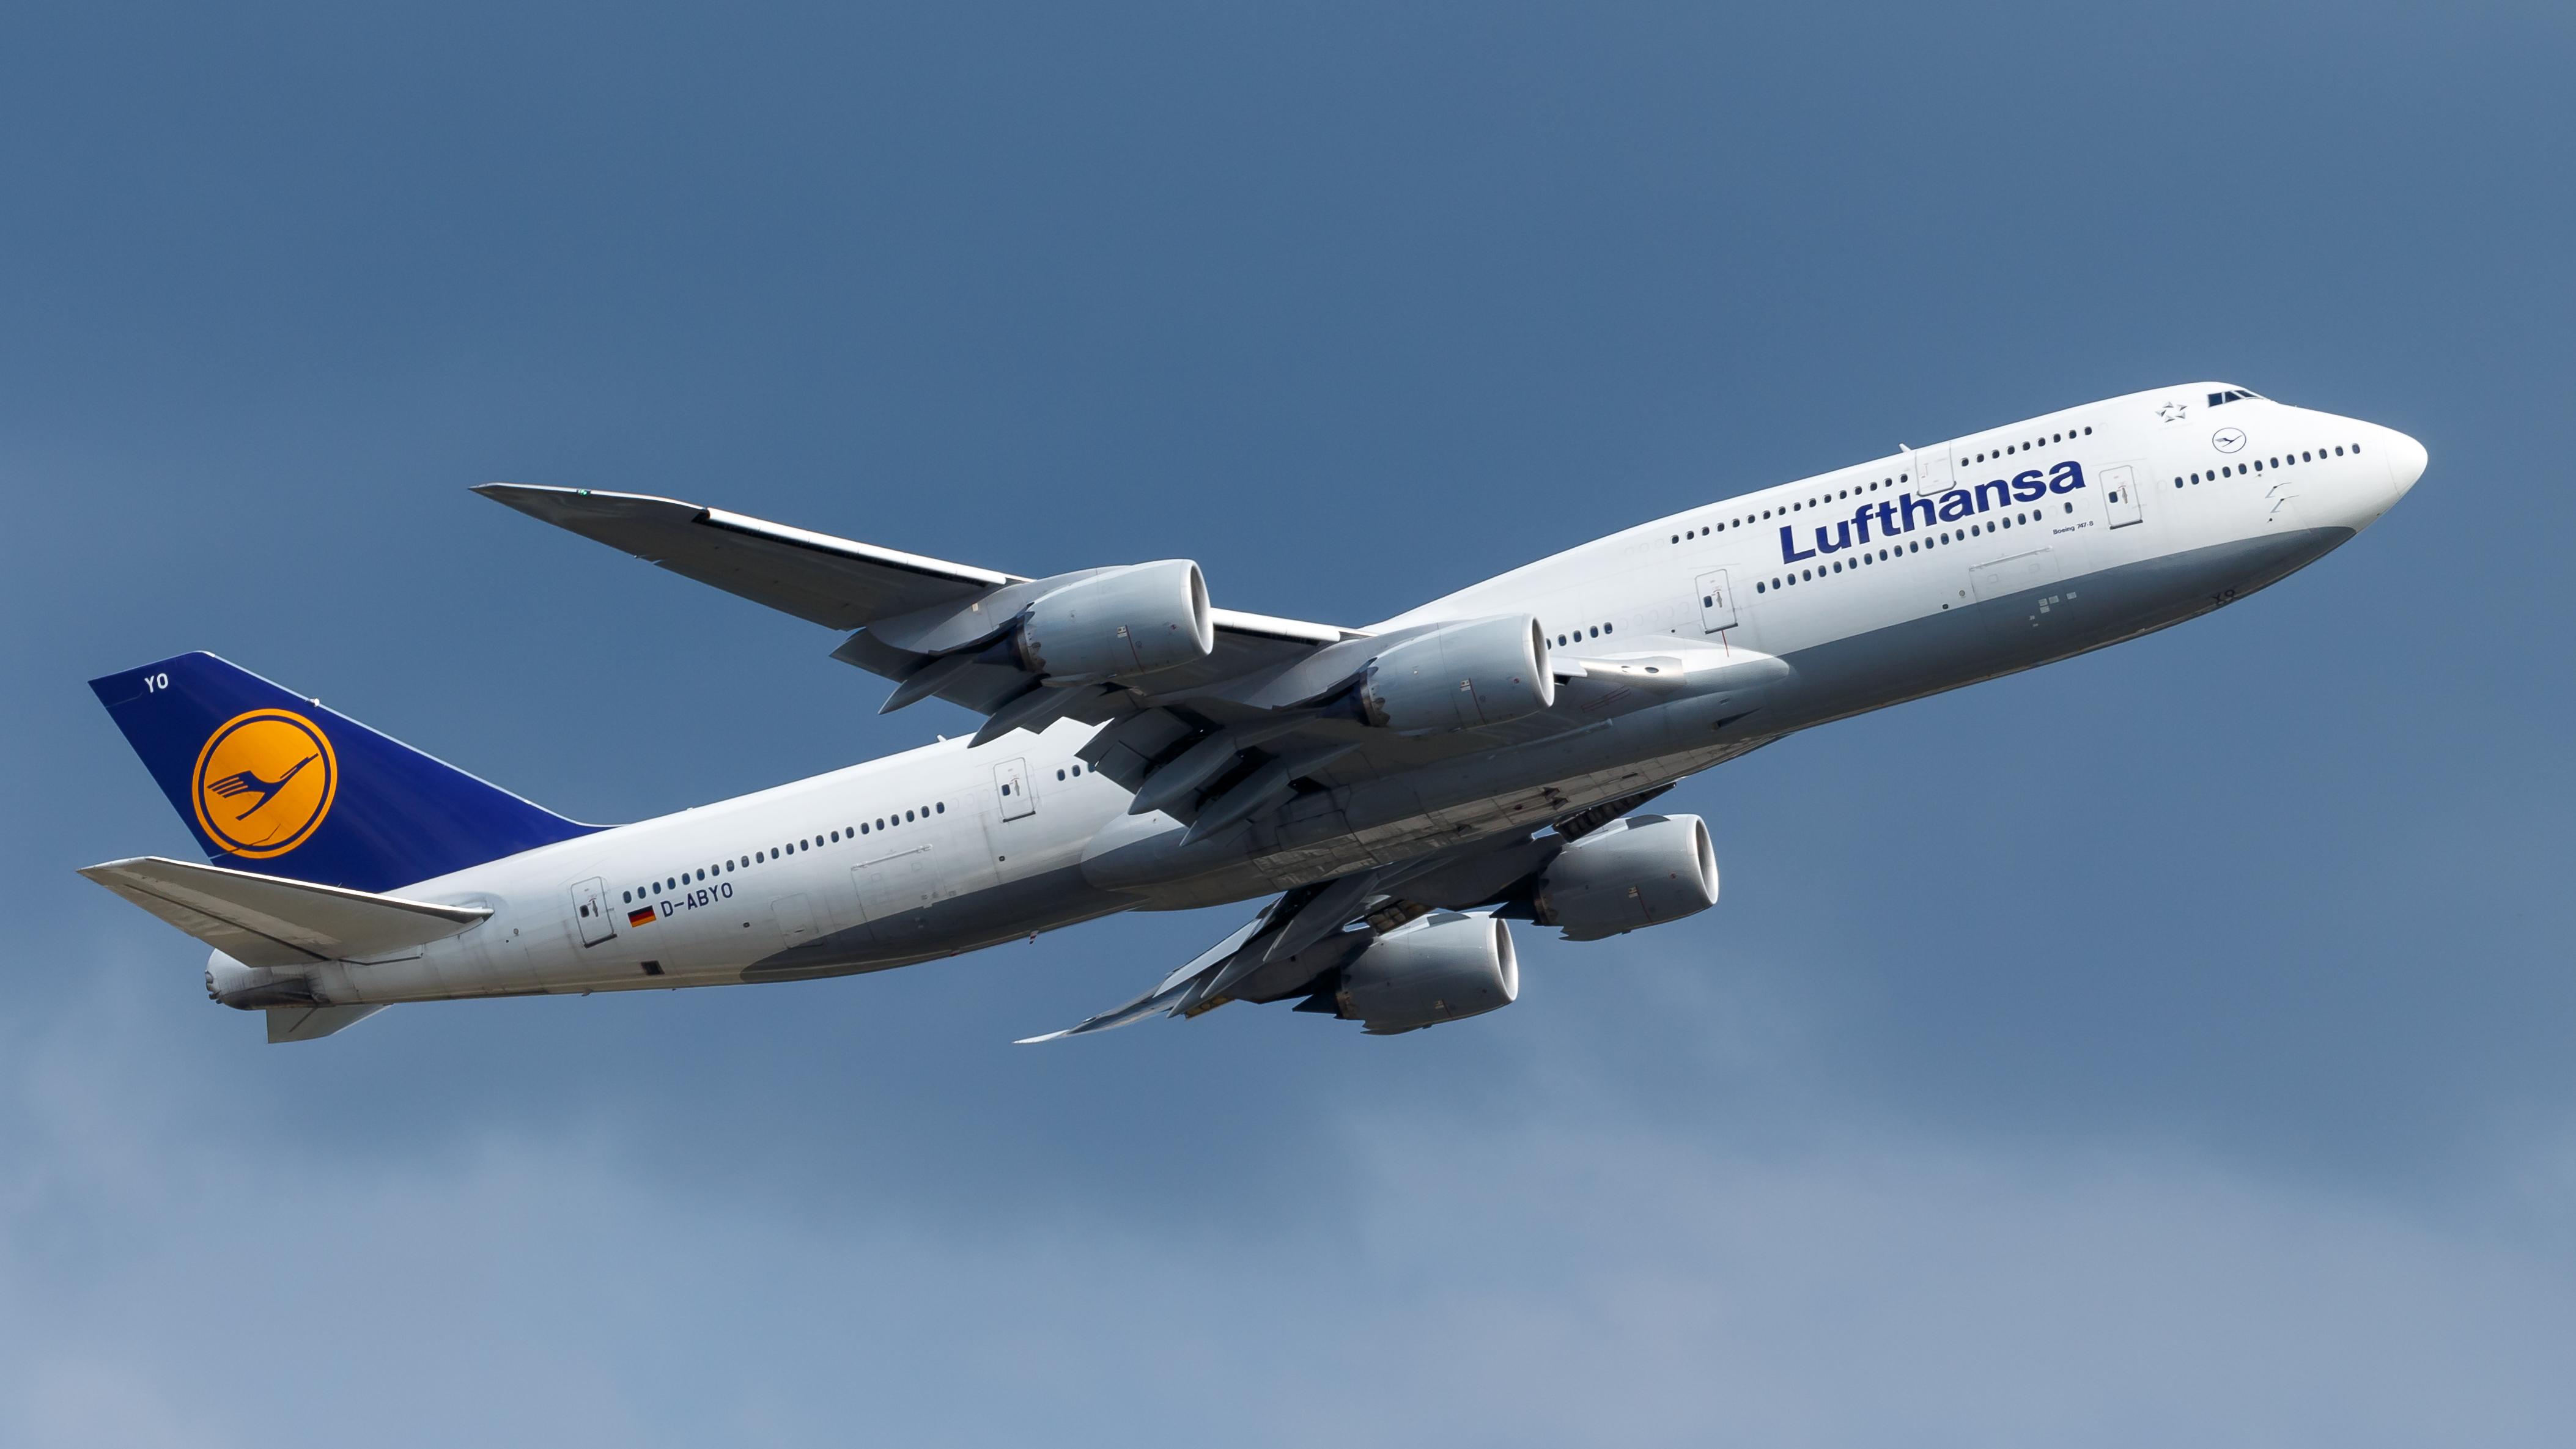 File:Lufthansa Boeing 747-8 (D-ABYO) at Frankfurt Airport (2